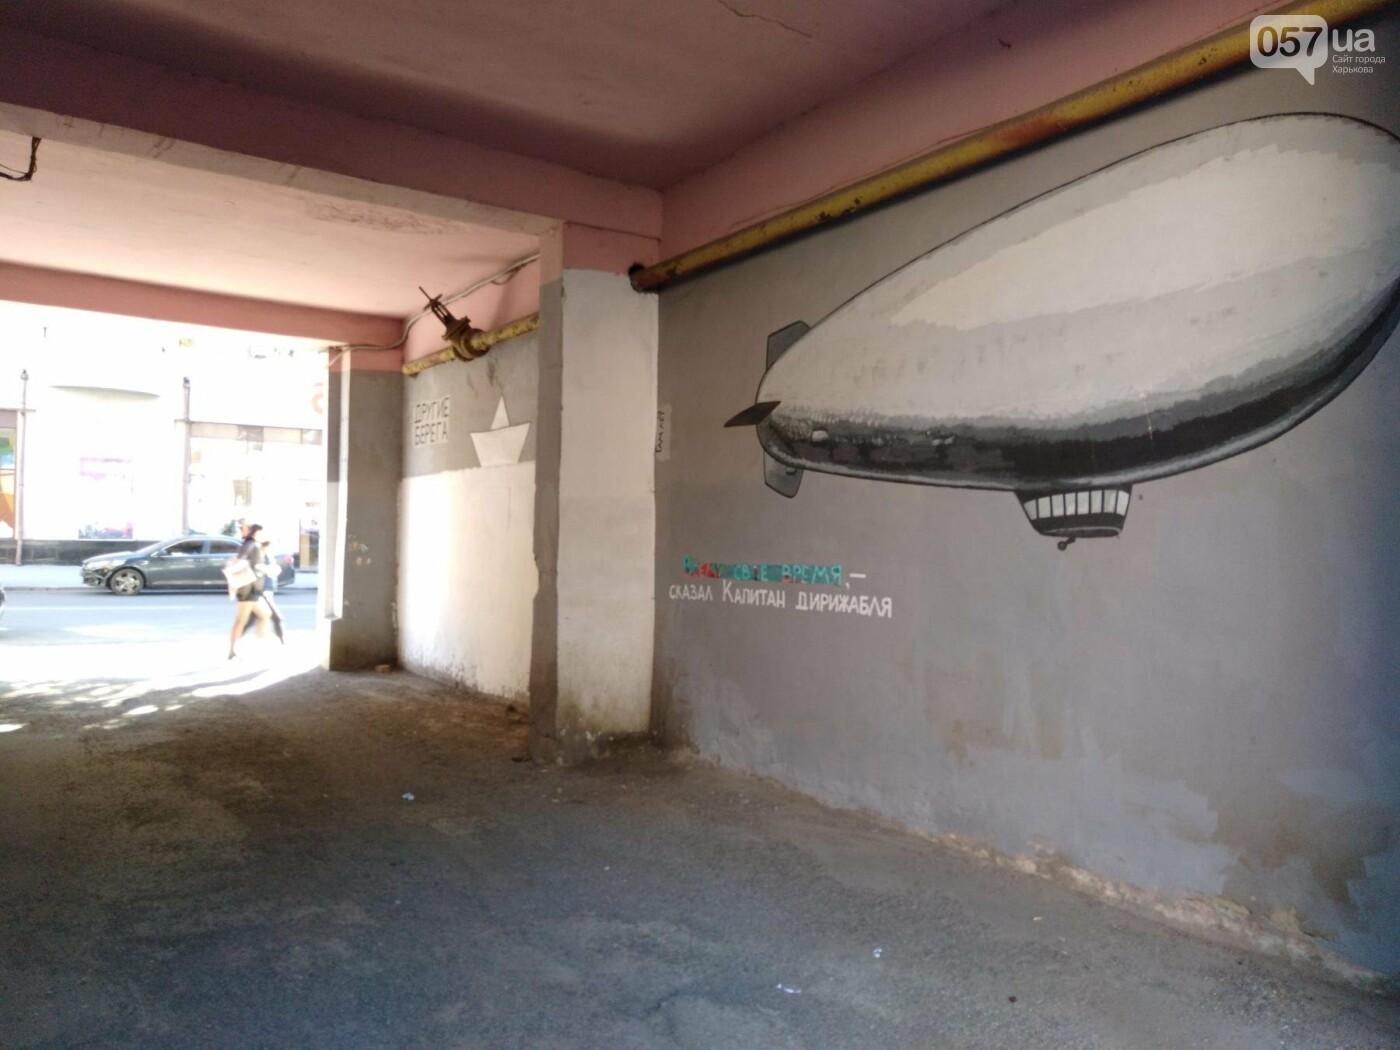 Стрит-арт Гамлета в Харькове: ТОП-10 граффити художника, - ФОТО, фото-29